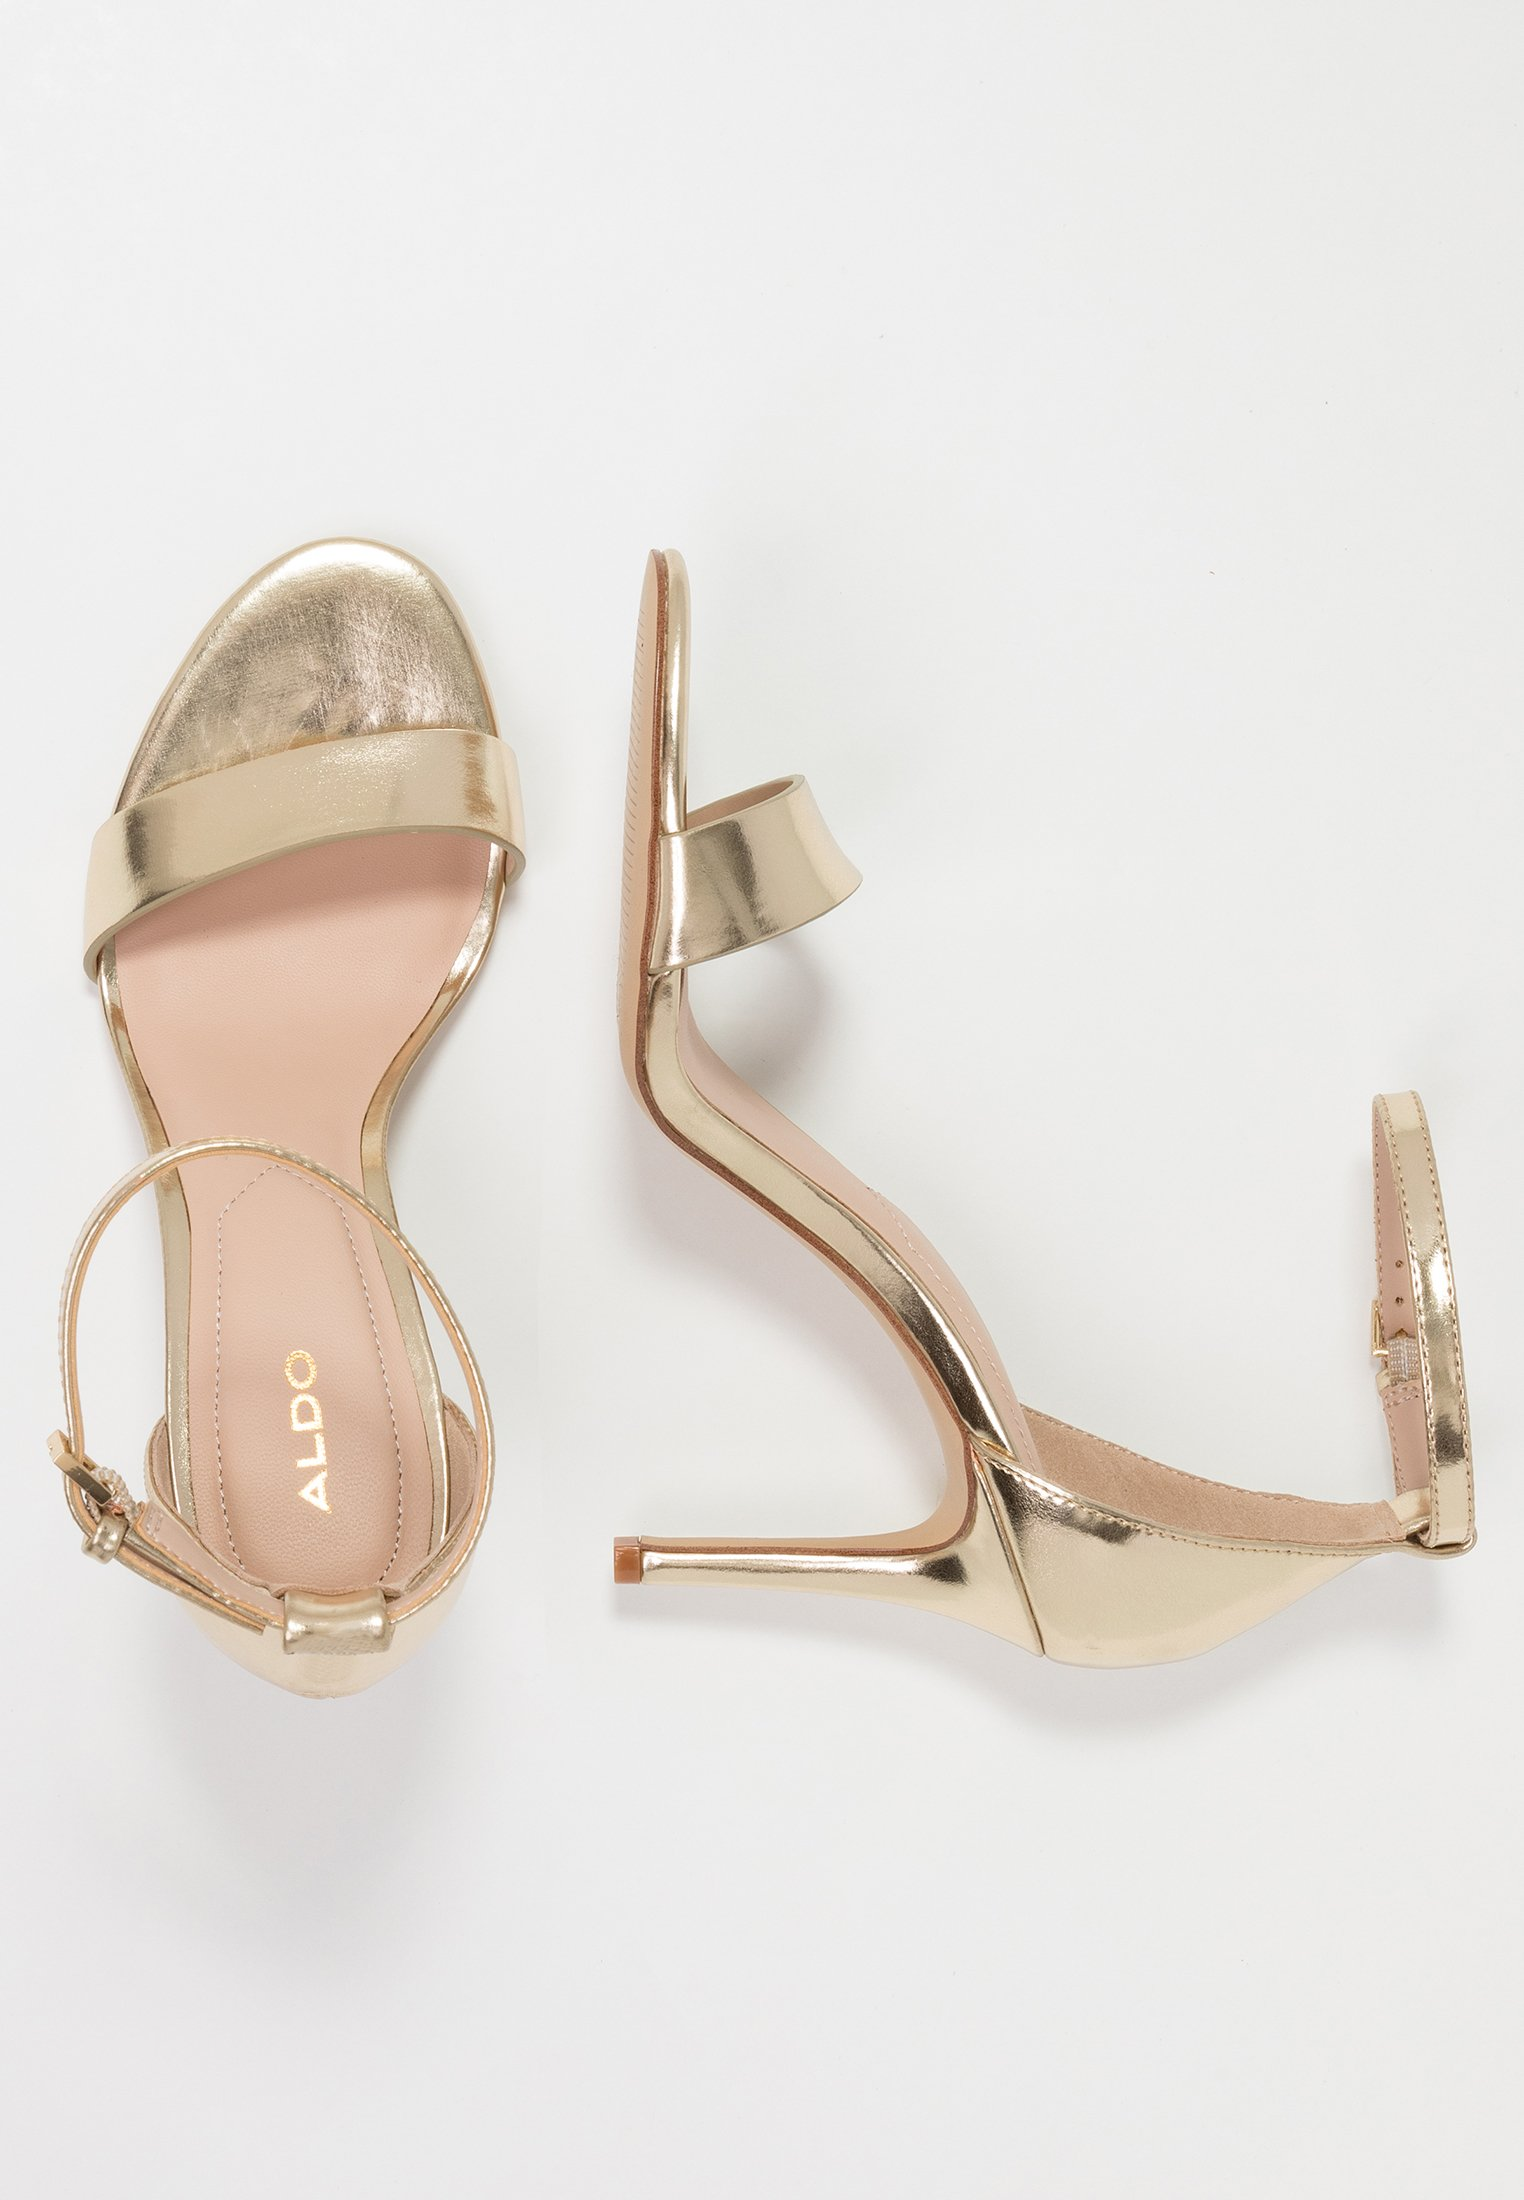 Aldo Piliria - Højhælede Sandaletter / Sandaler Gold